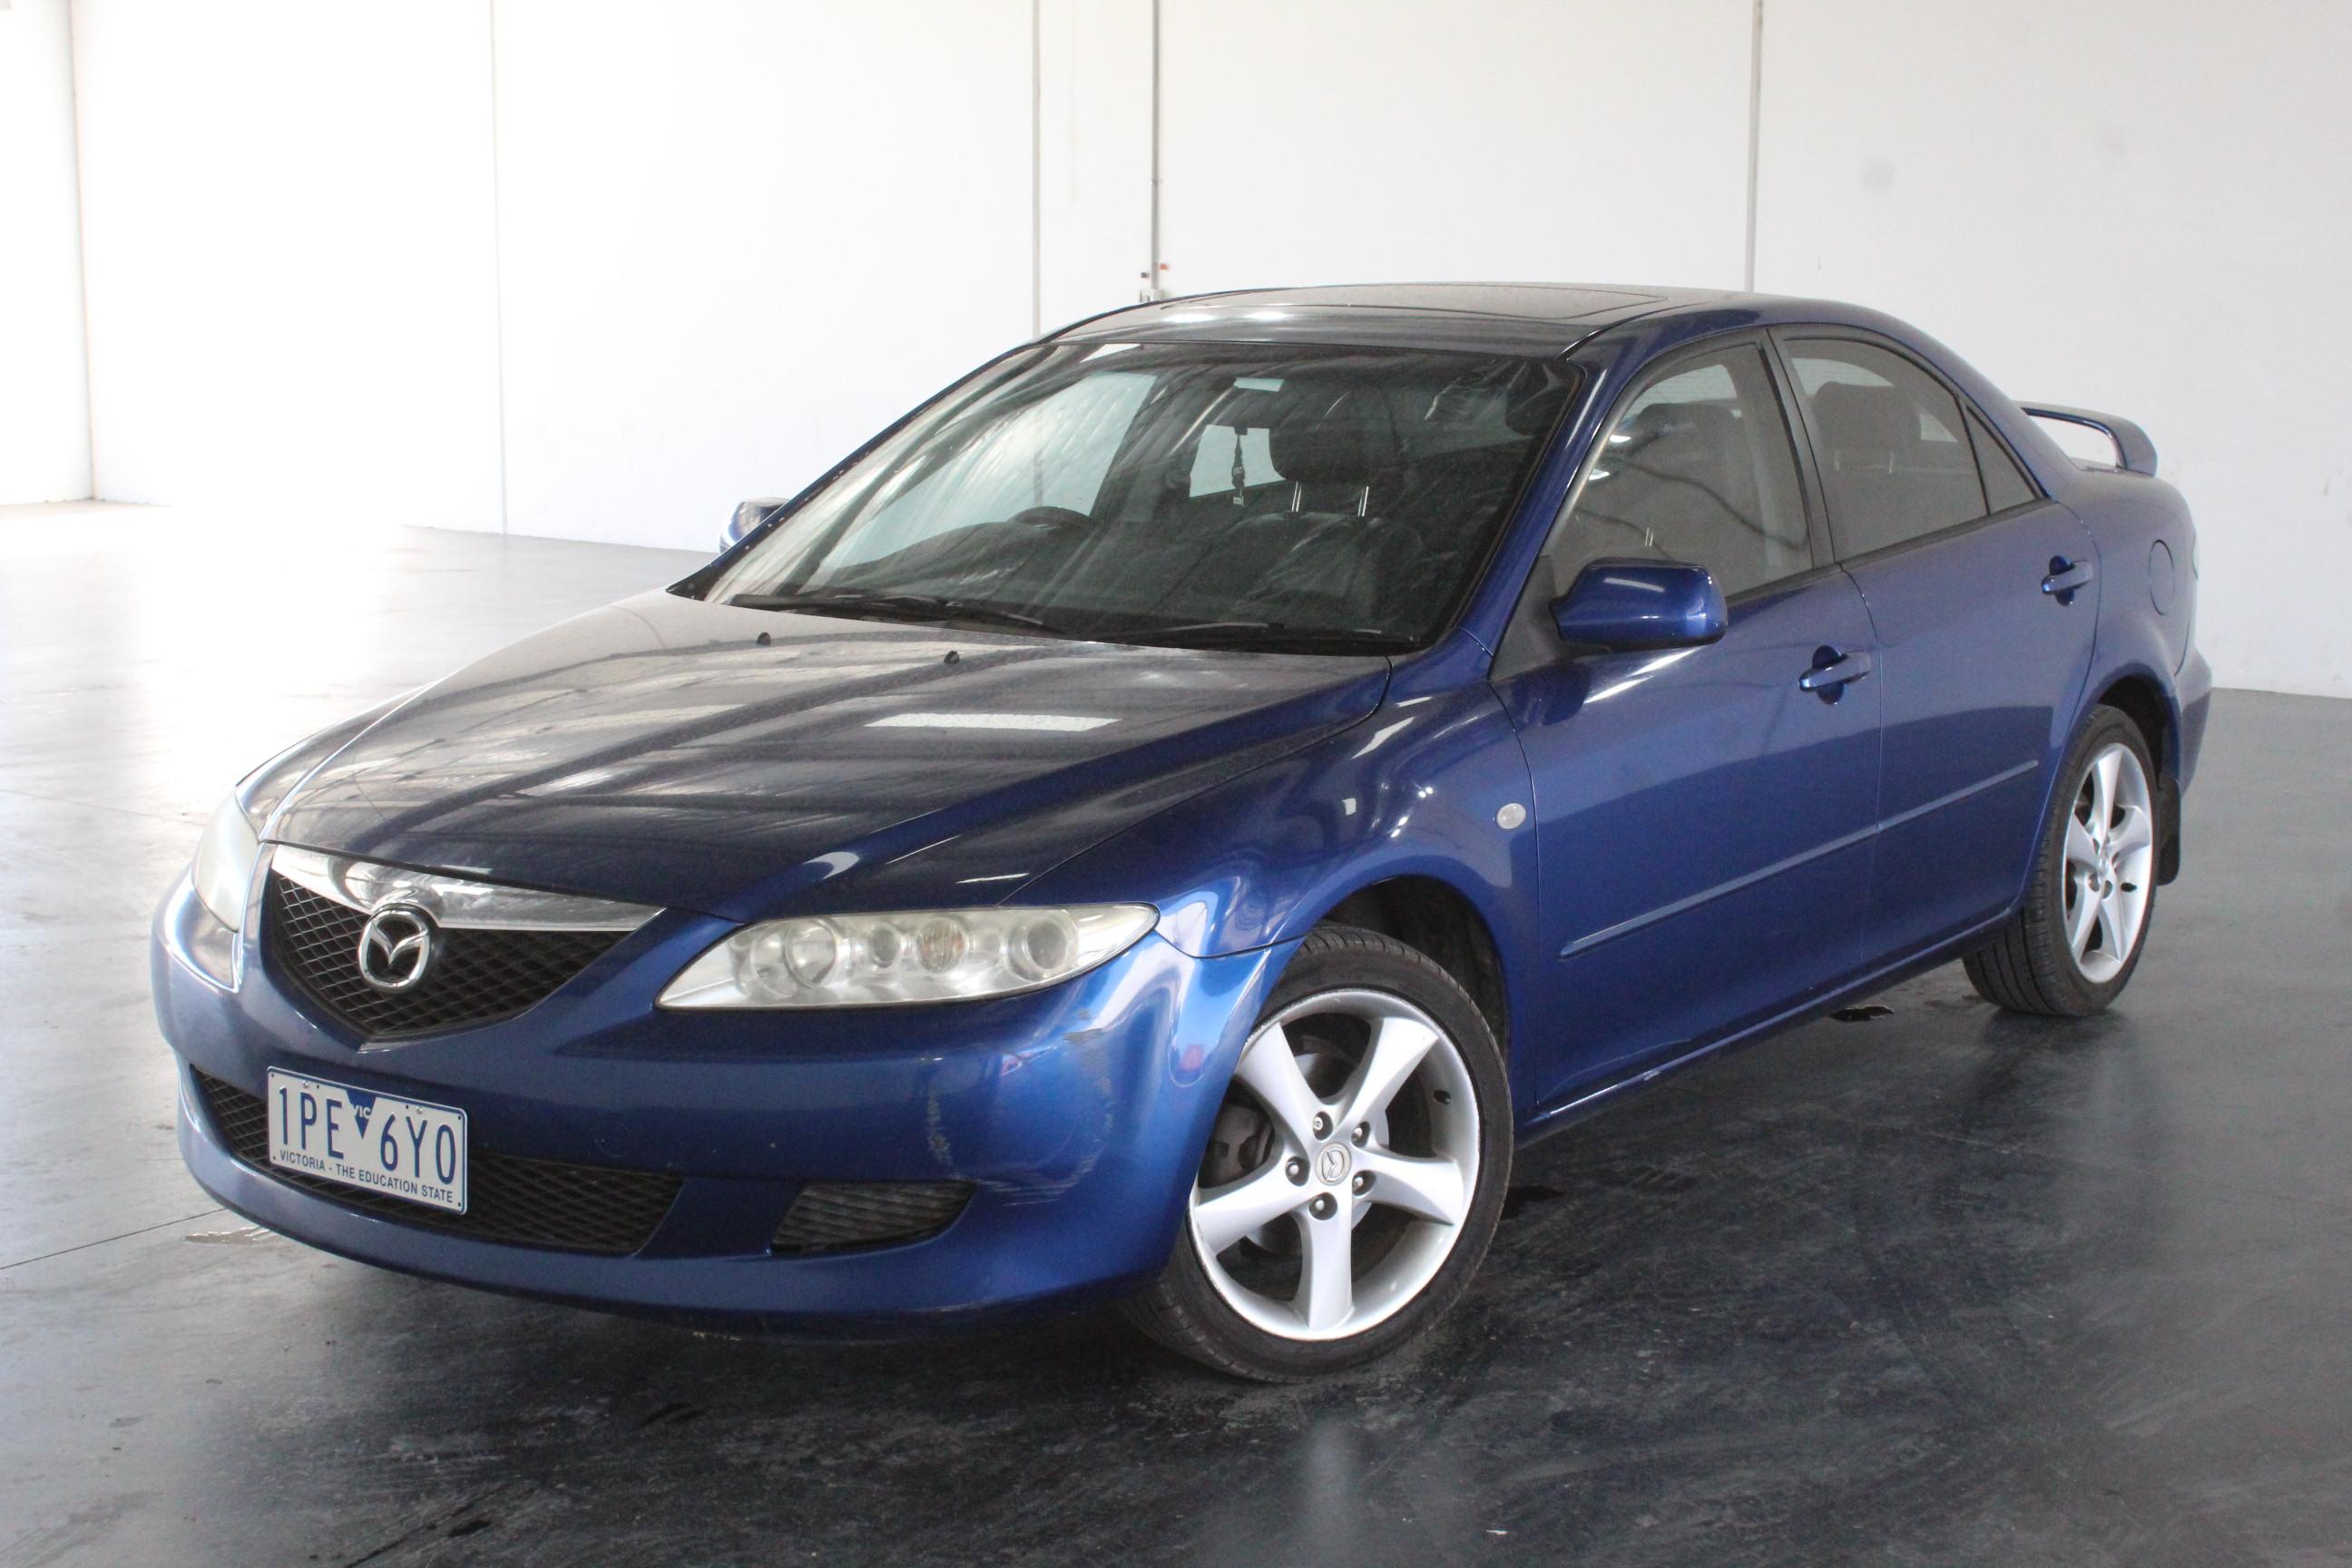 2003 Mazda 6 Luxury GG Automatic Sedan